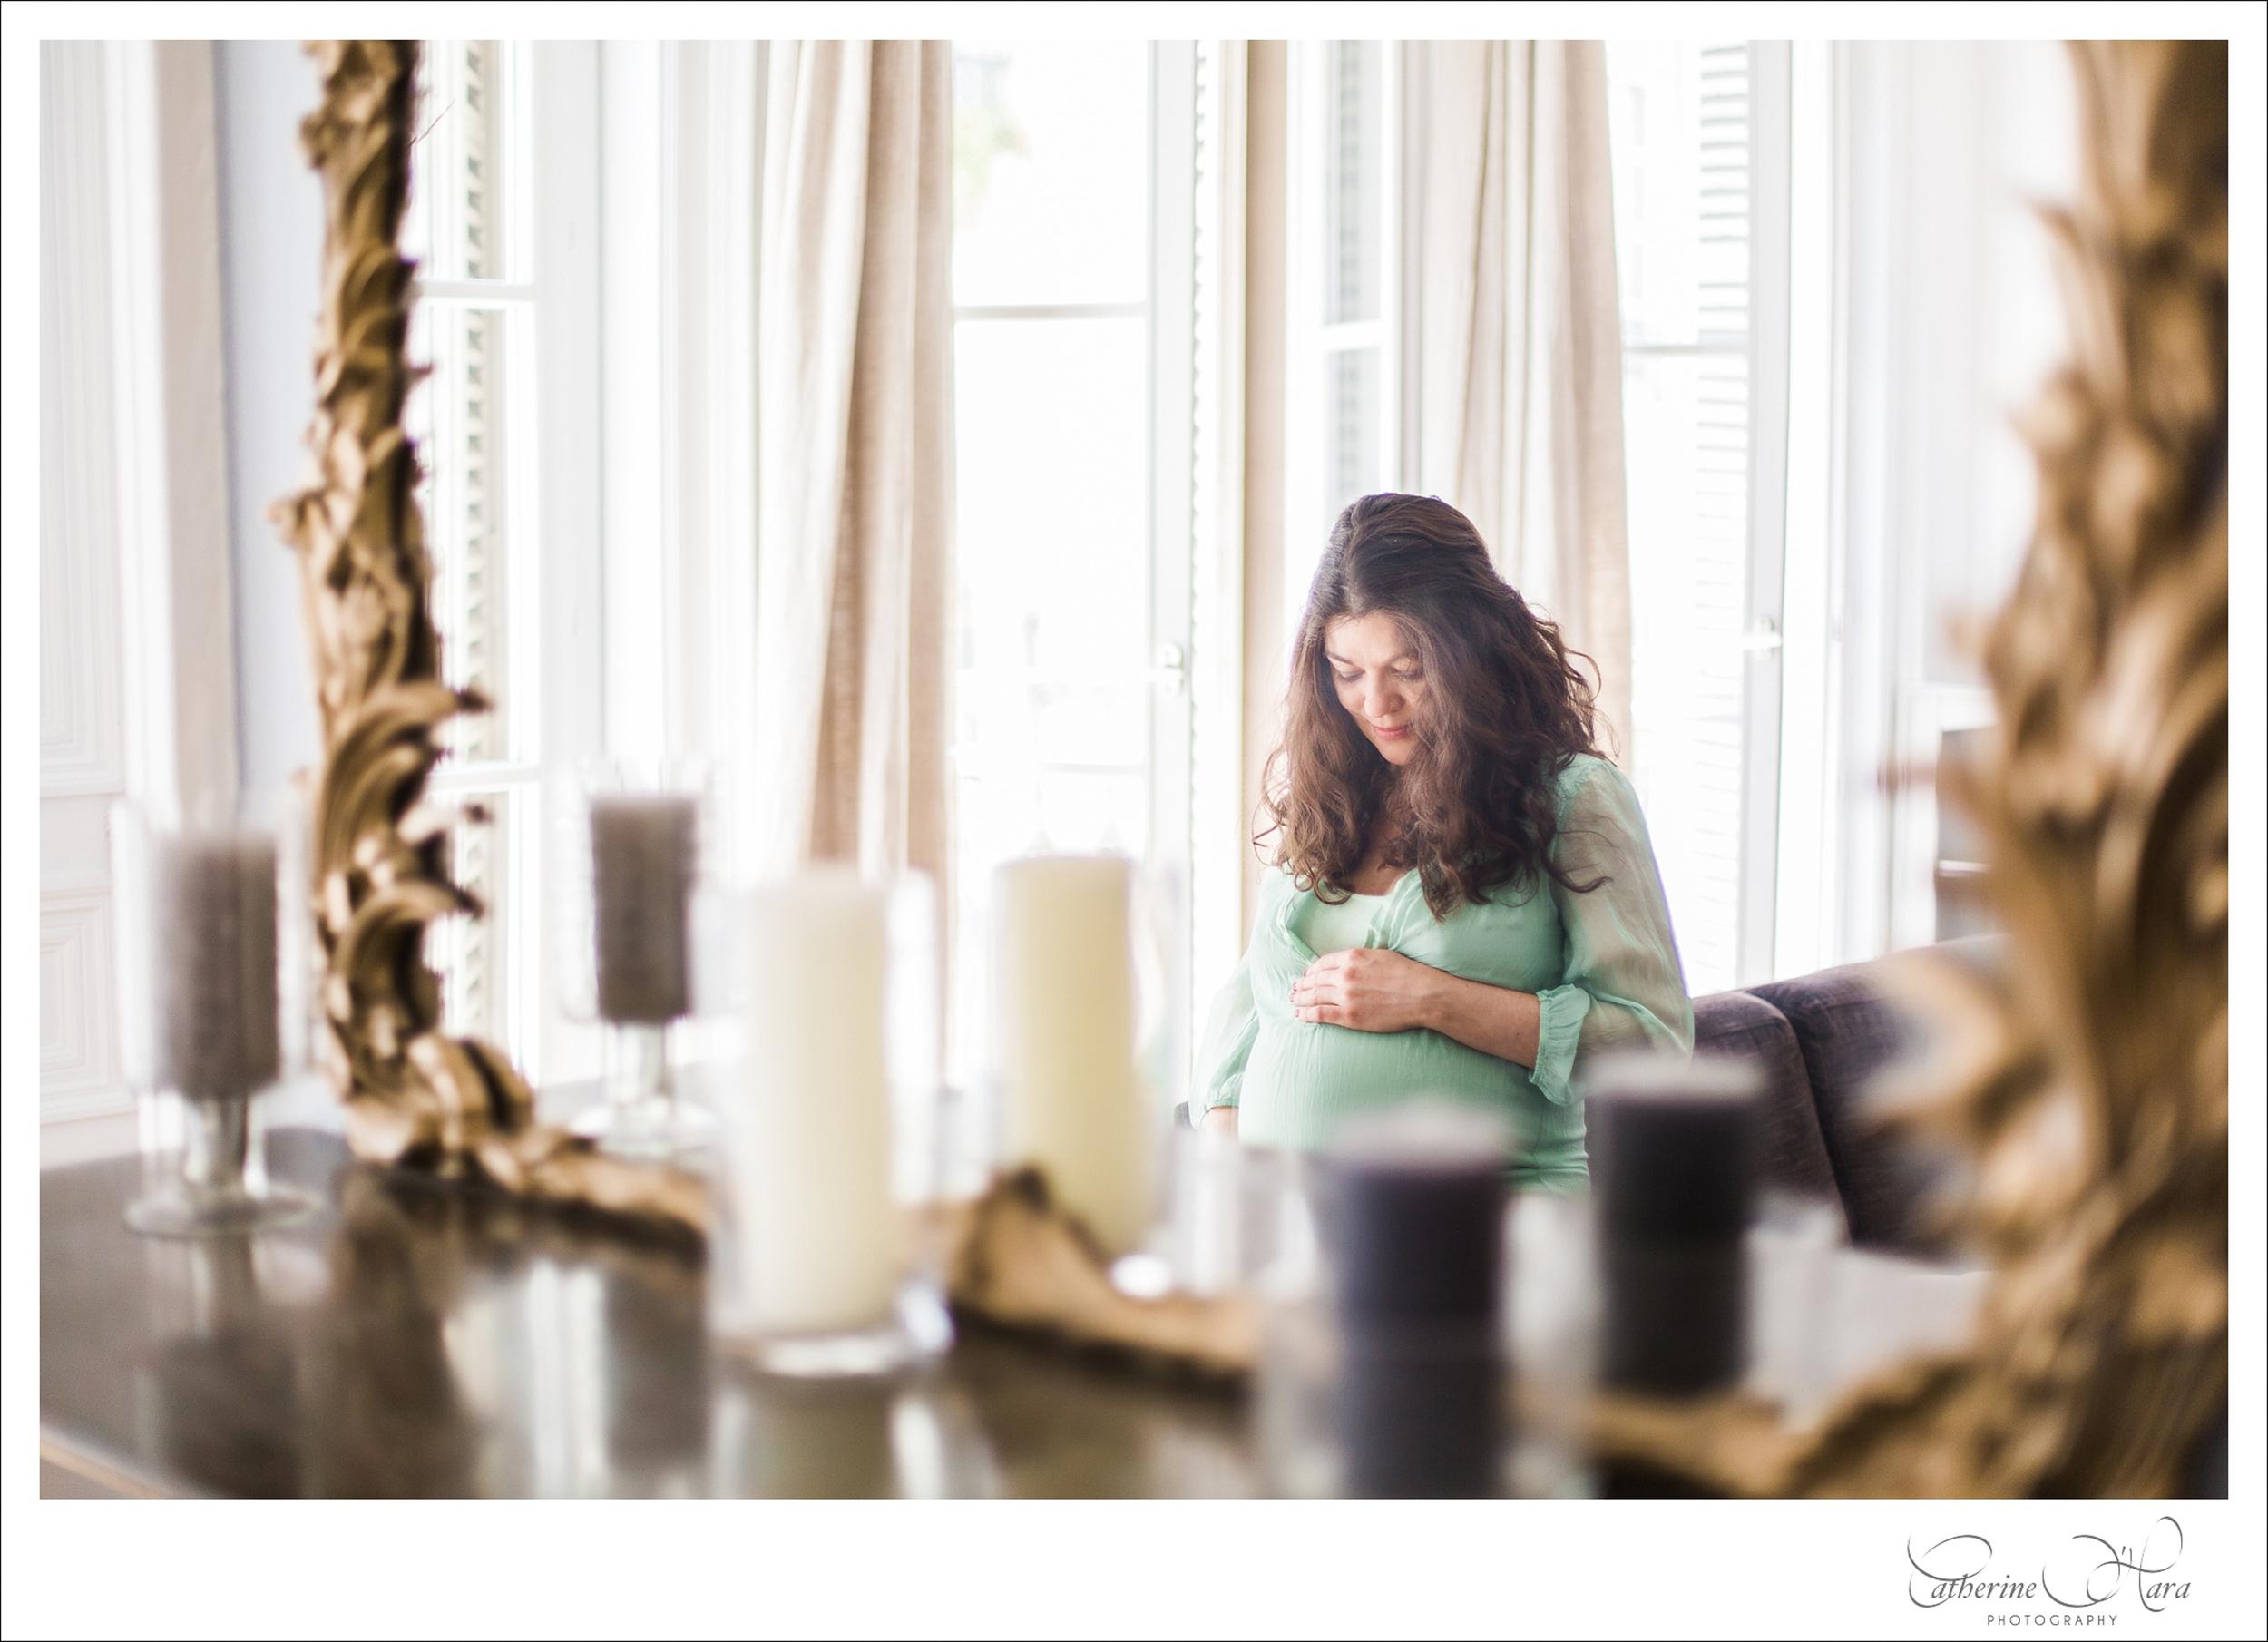 paris-photographer-maternity-shoot-04.jpg